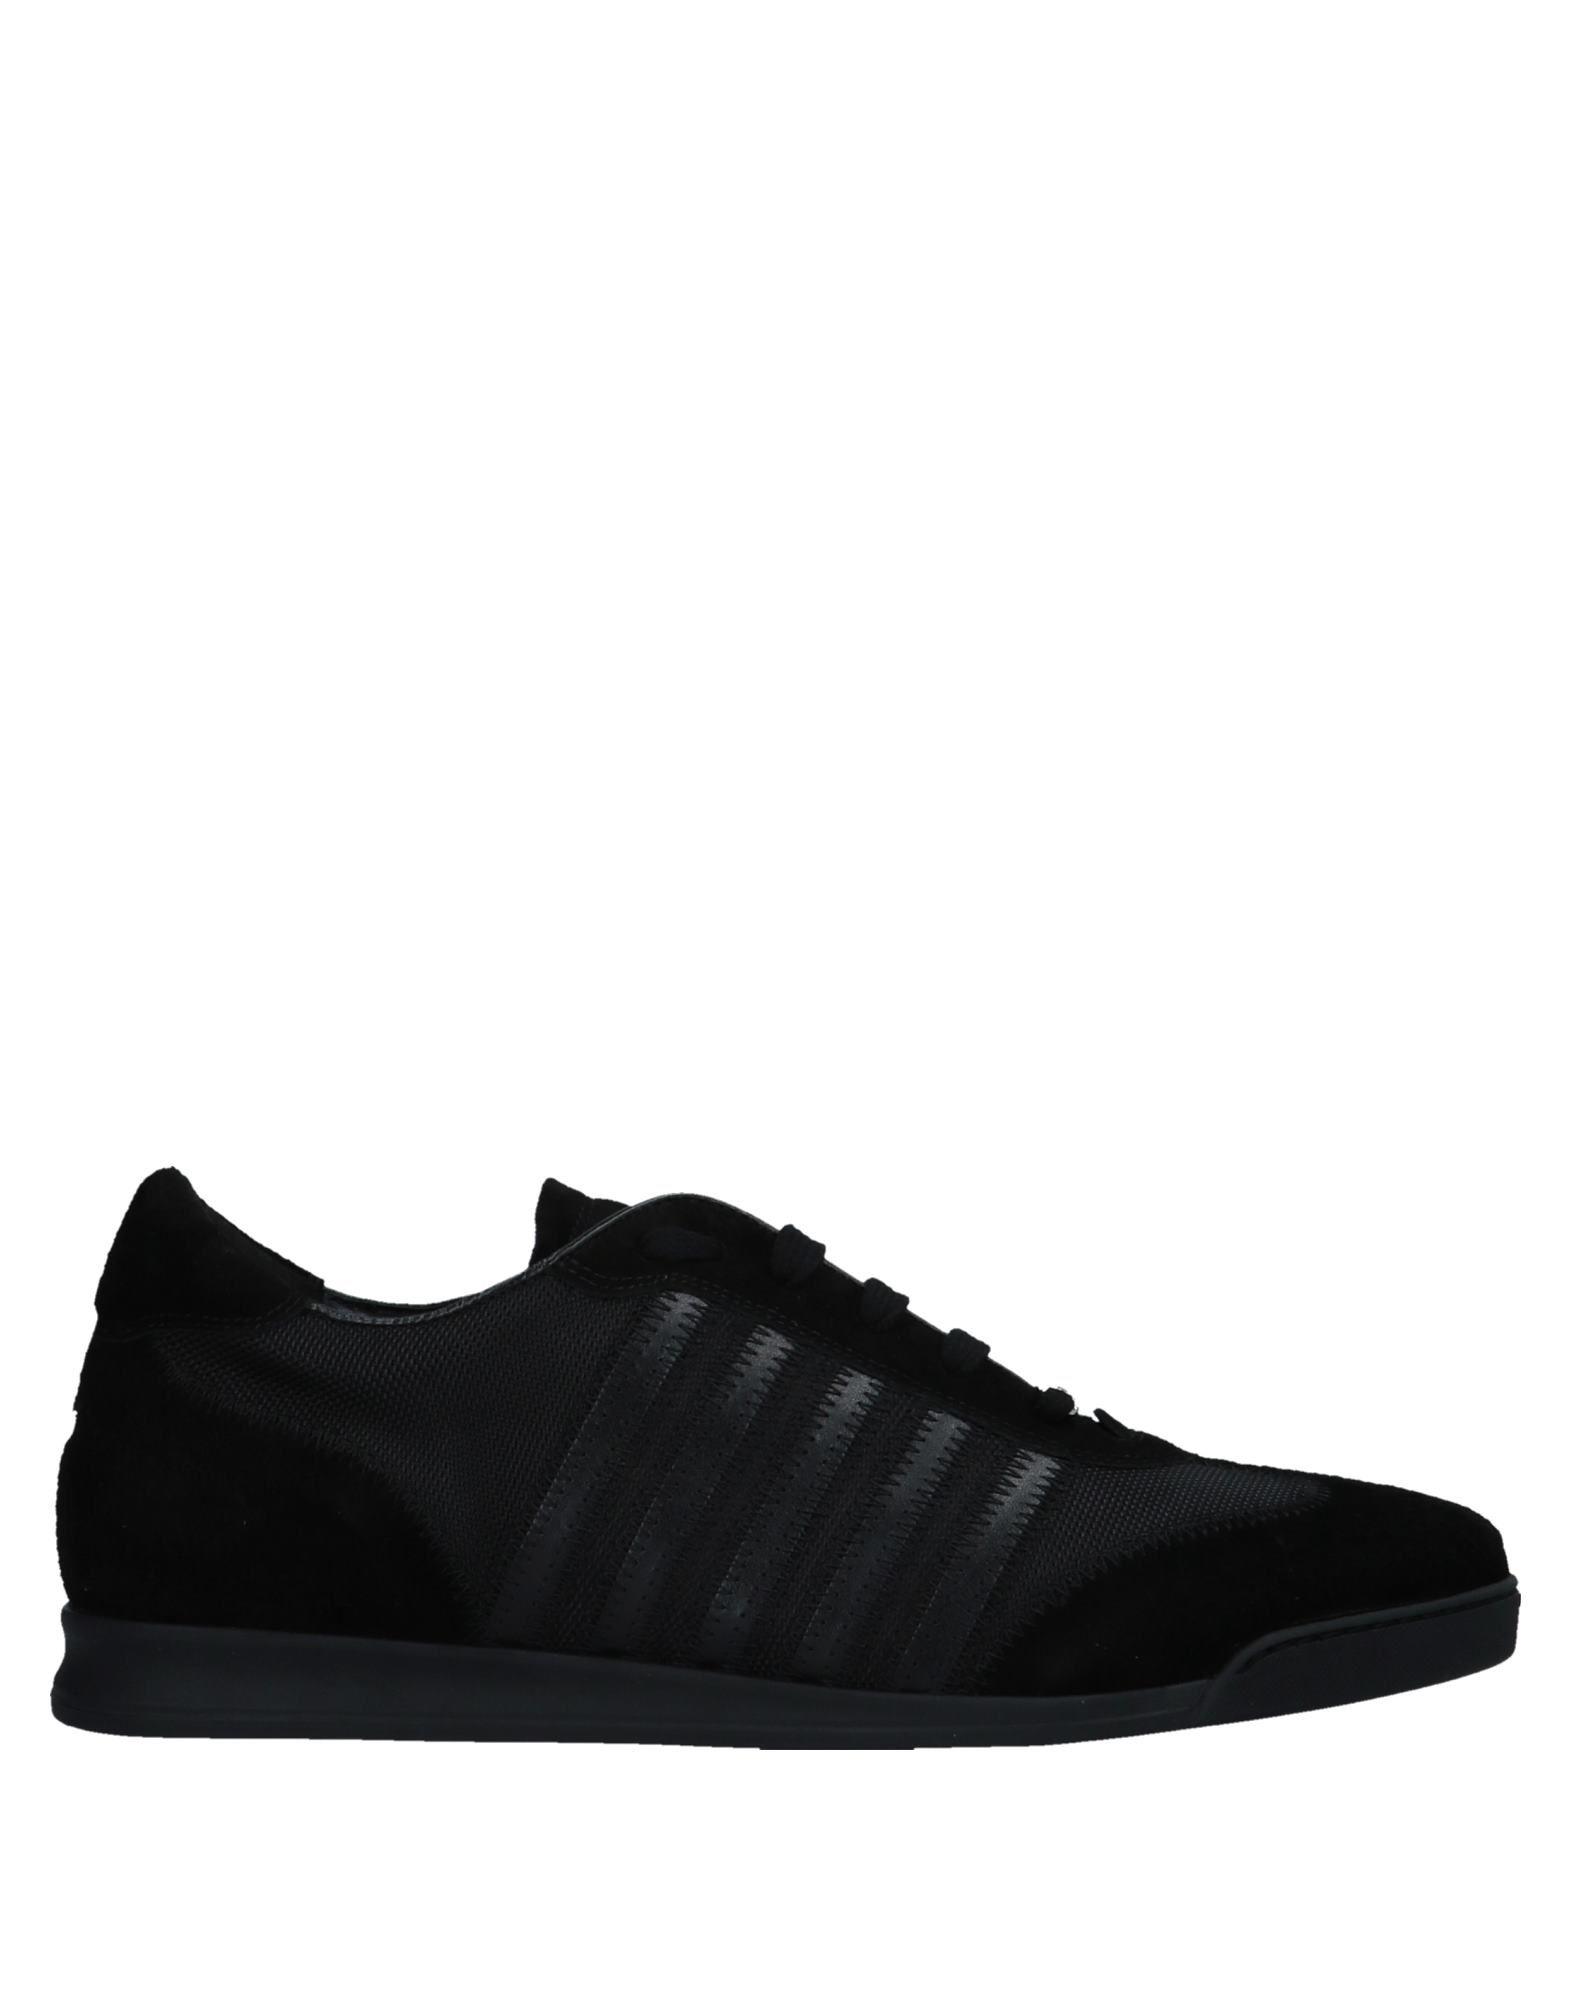 Dsquared2 Gute Sneakers Herren  11535783FG Gute Dsquared2 Qualität beliebte Schuhe df43eb